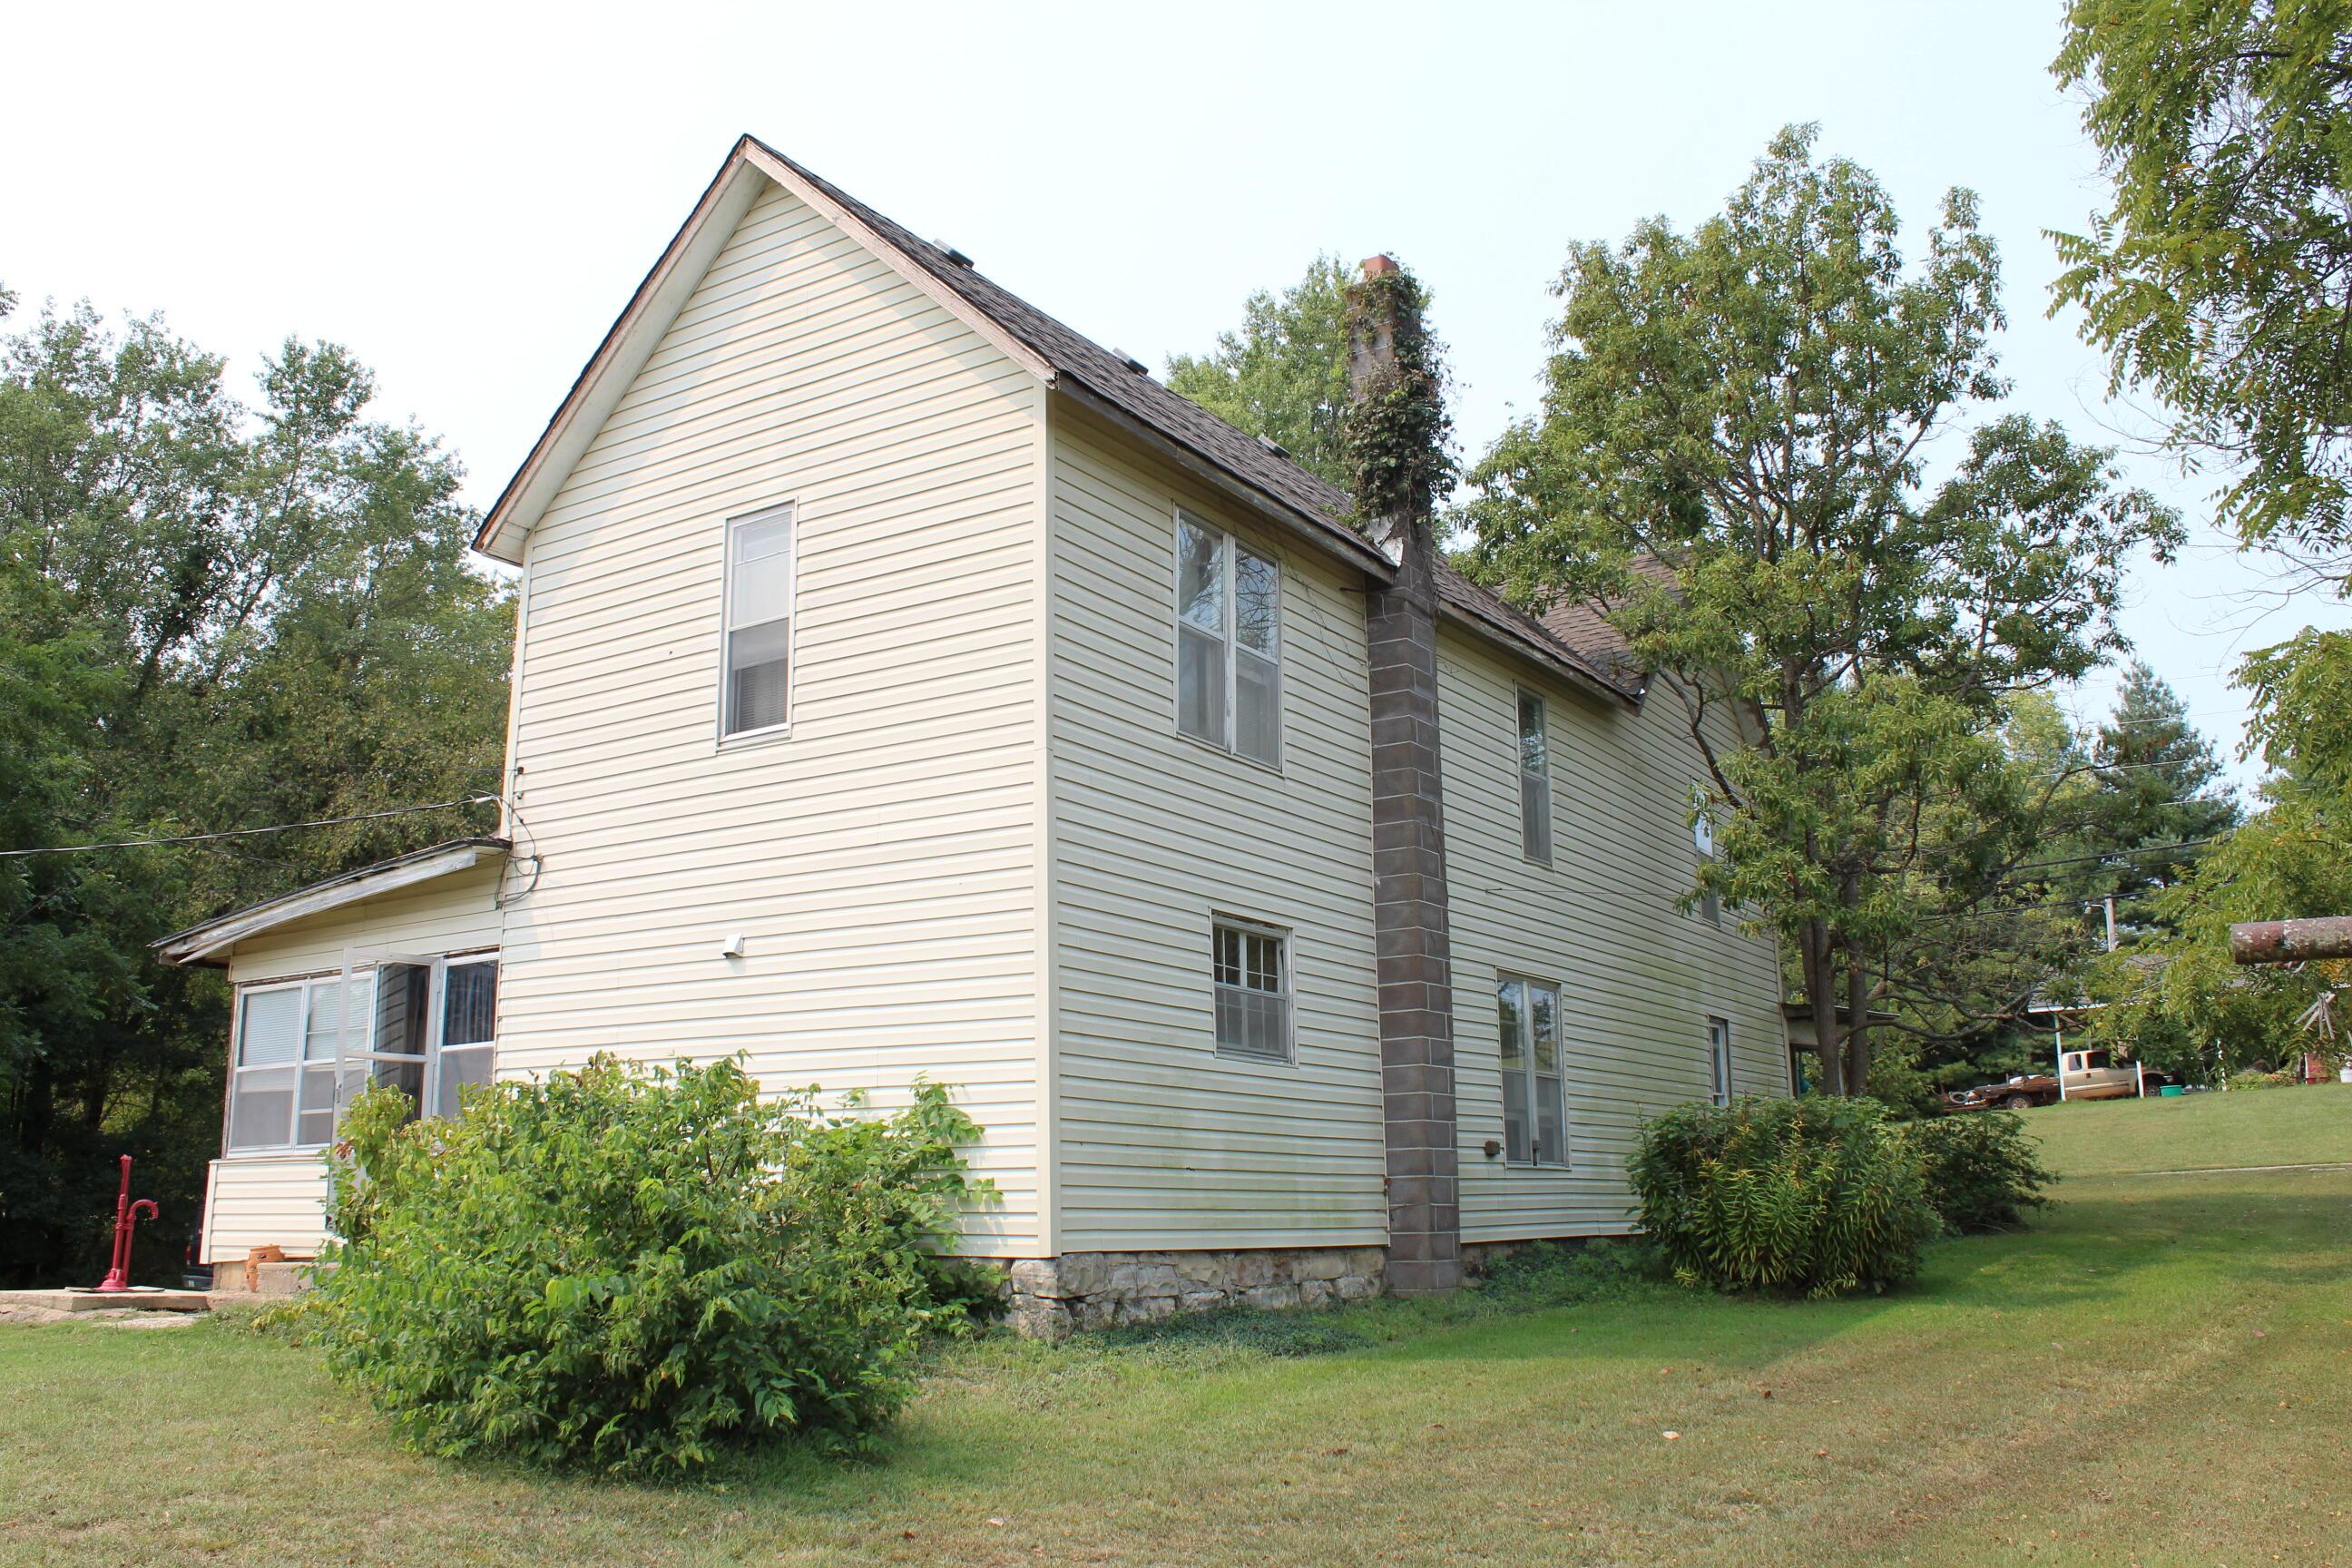 1880 Farmhouse